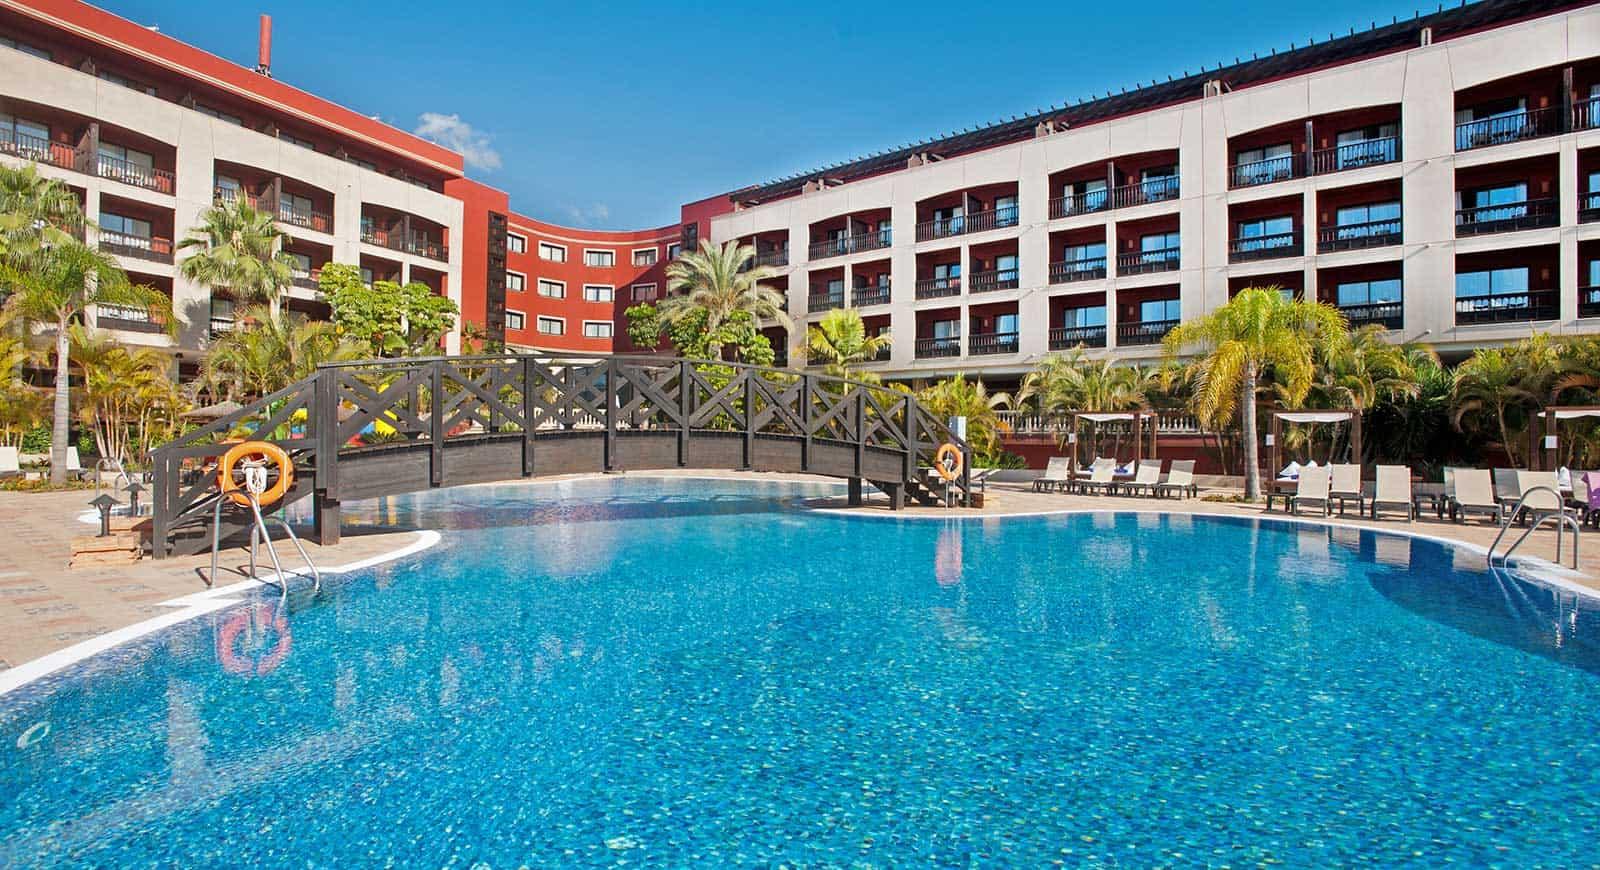 barcelo hotel marbella golf accomodation